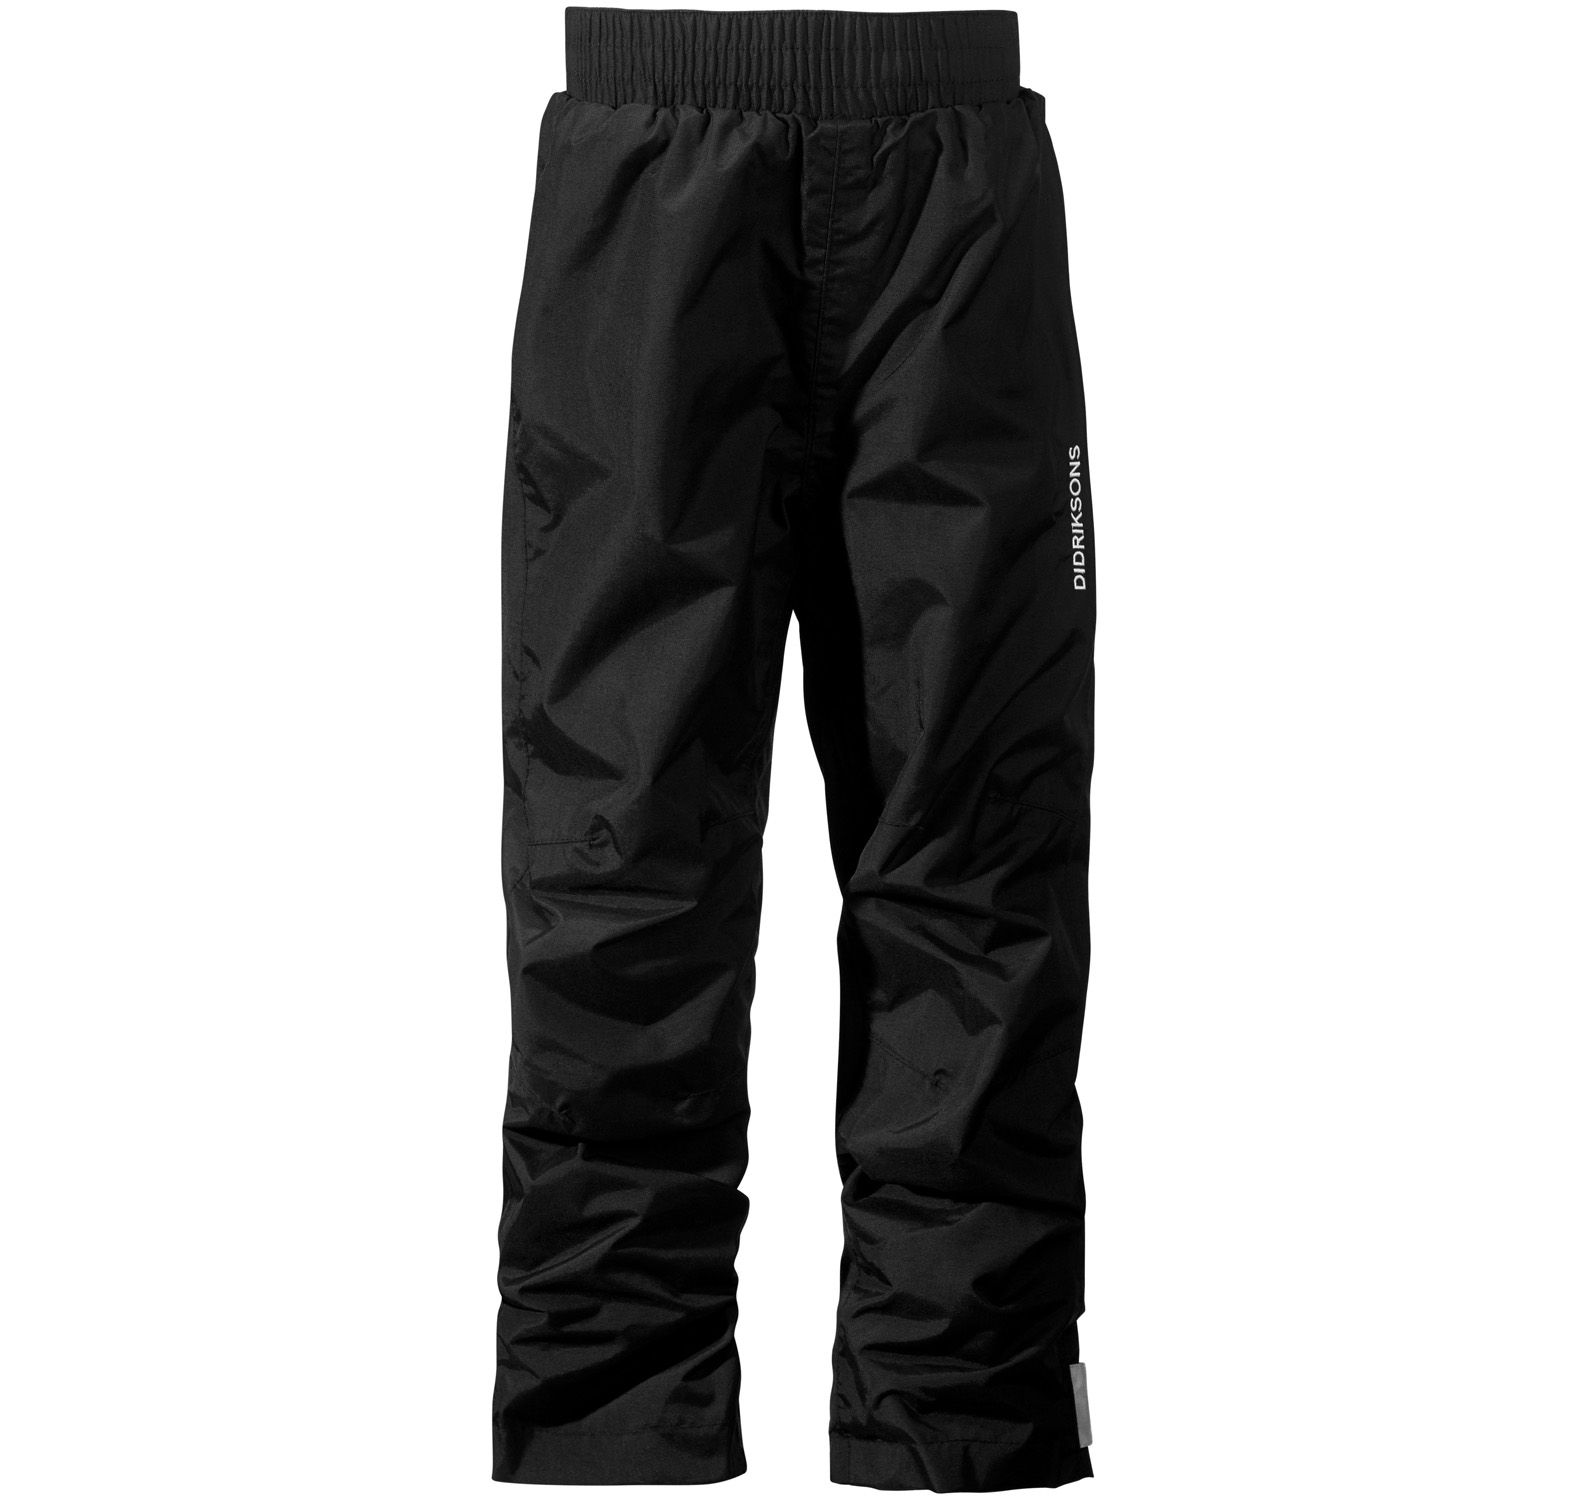 nobi kids pants 3, black, 120, didriksons regnkläder